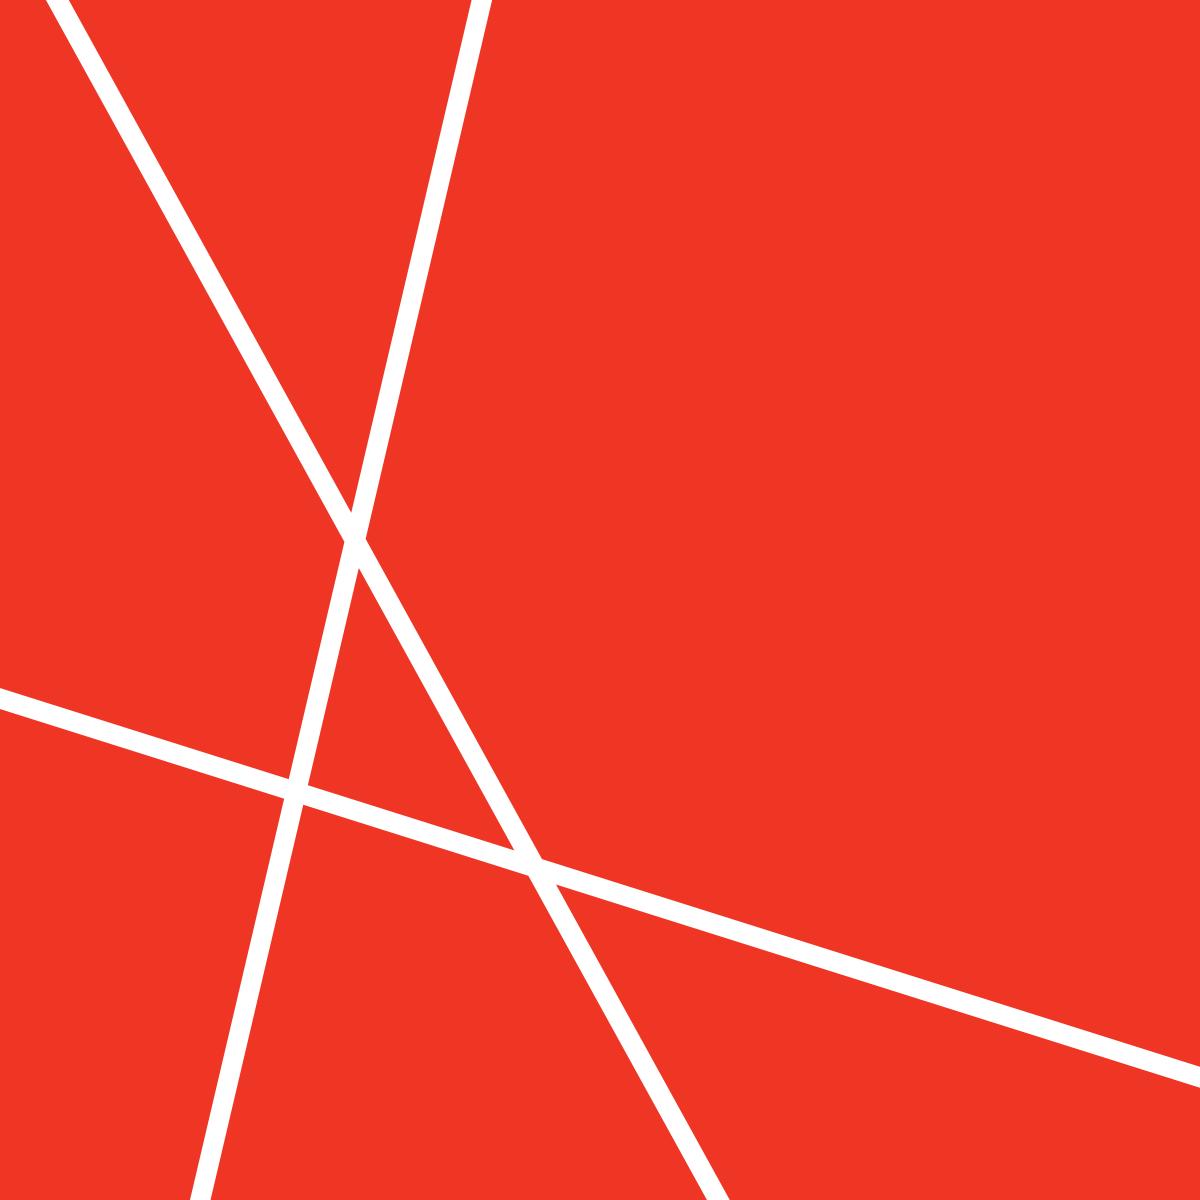 00_Ambler Architects Logomark - Standard.png